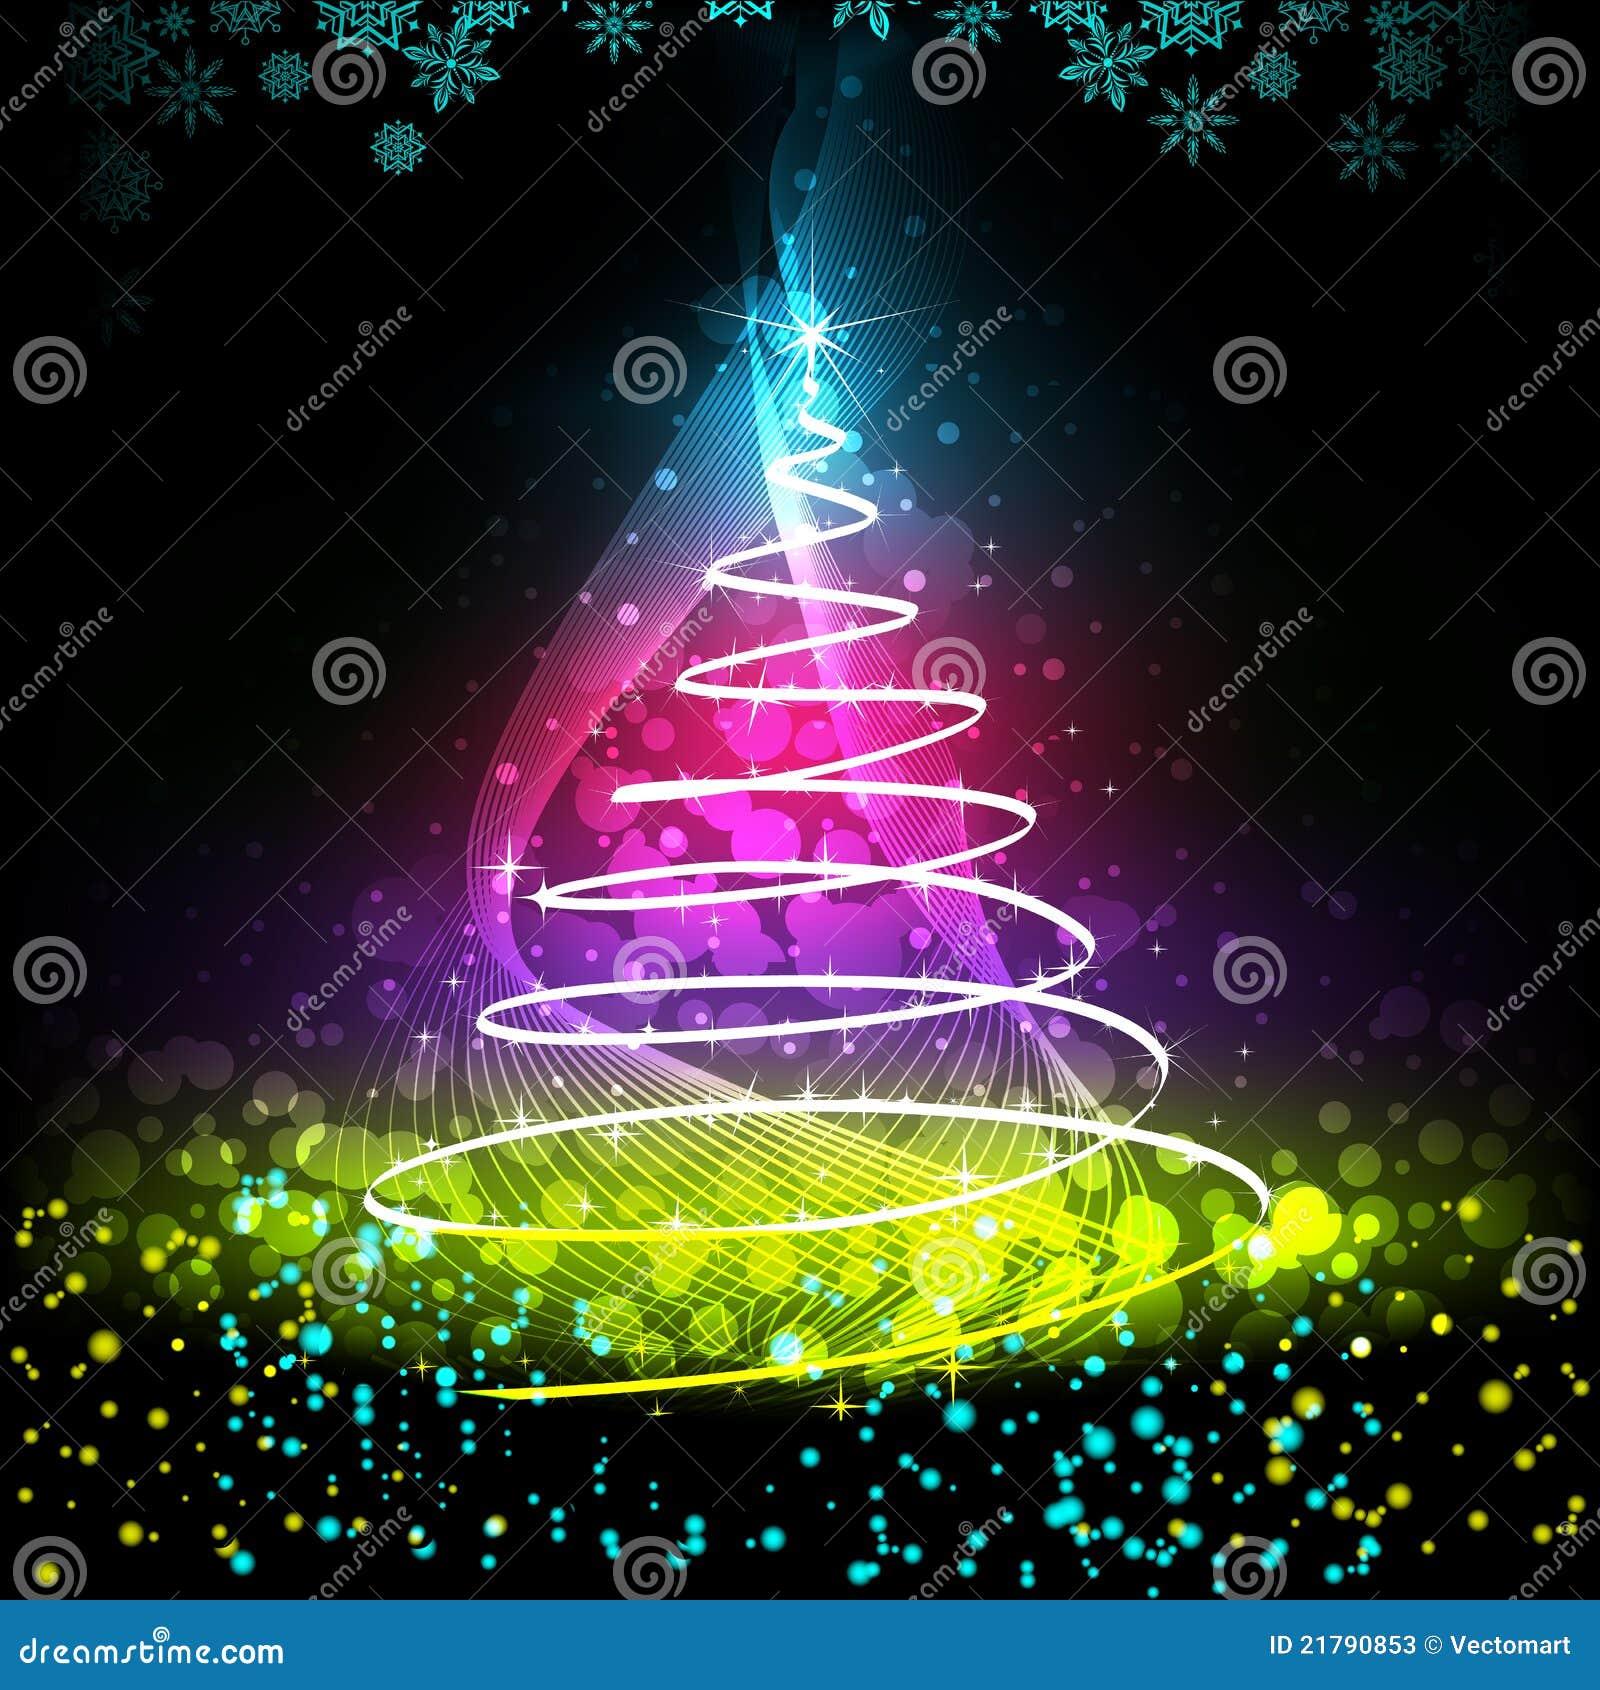 Colorful Christmas Tree Stock Photos - Image: 21790853